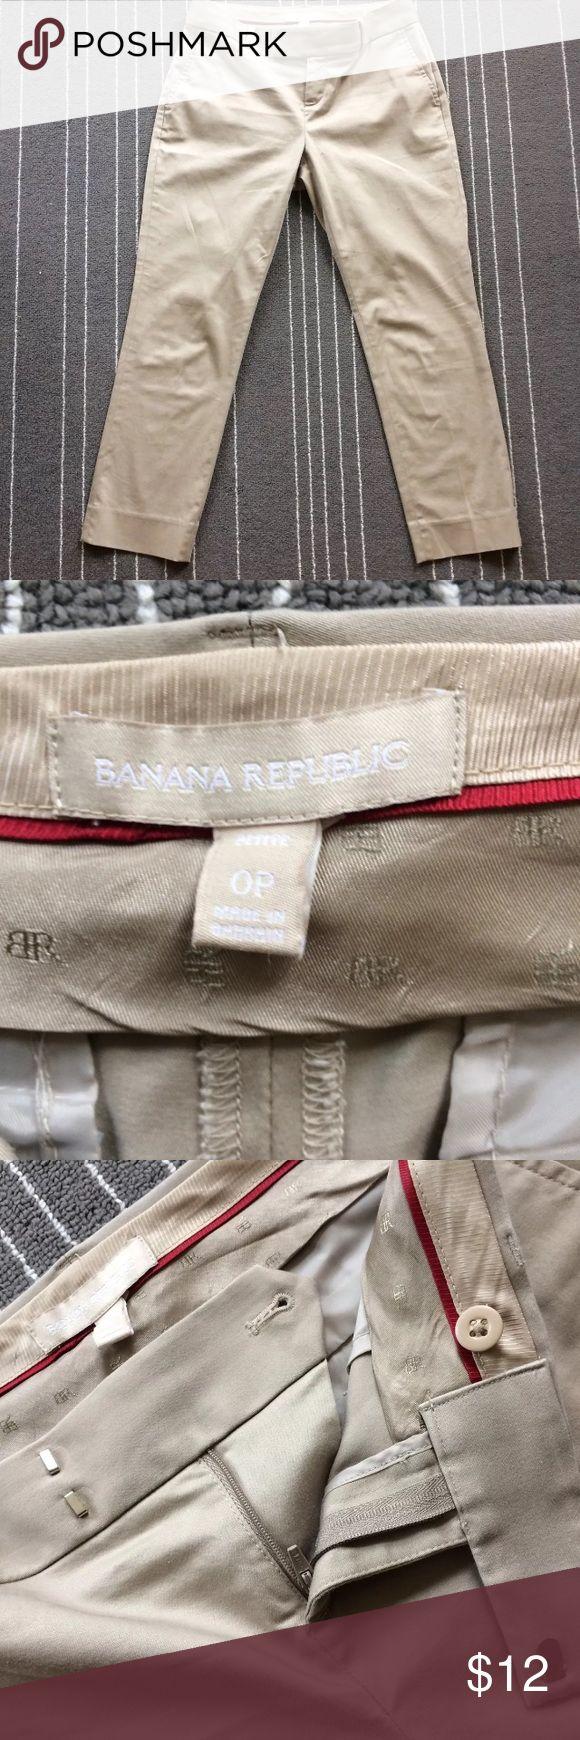 "Banana Republic cropped khaki capri pants 0P Excellent condition khaki color women's cropped pants capris size 0P from Banana Republic.  Measures flat approximately 14"" across waist, 32.5"" lengthwise and has inseam of 22.5"" Banana Republic Pants Capris"